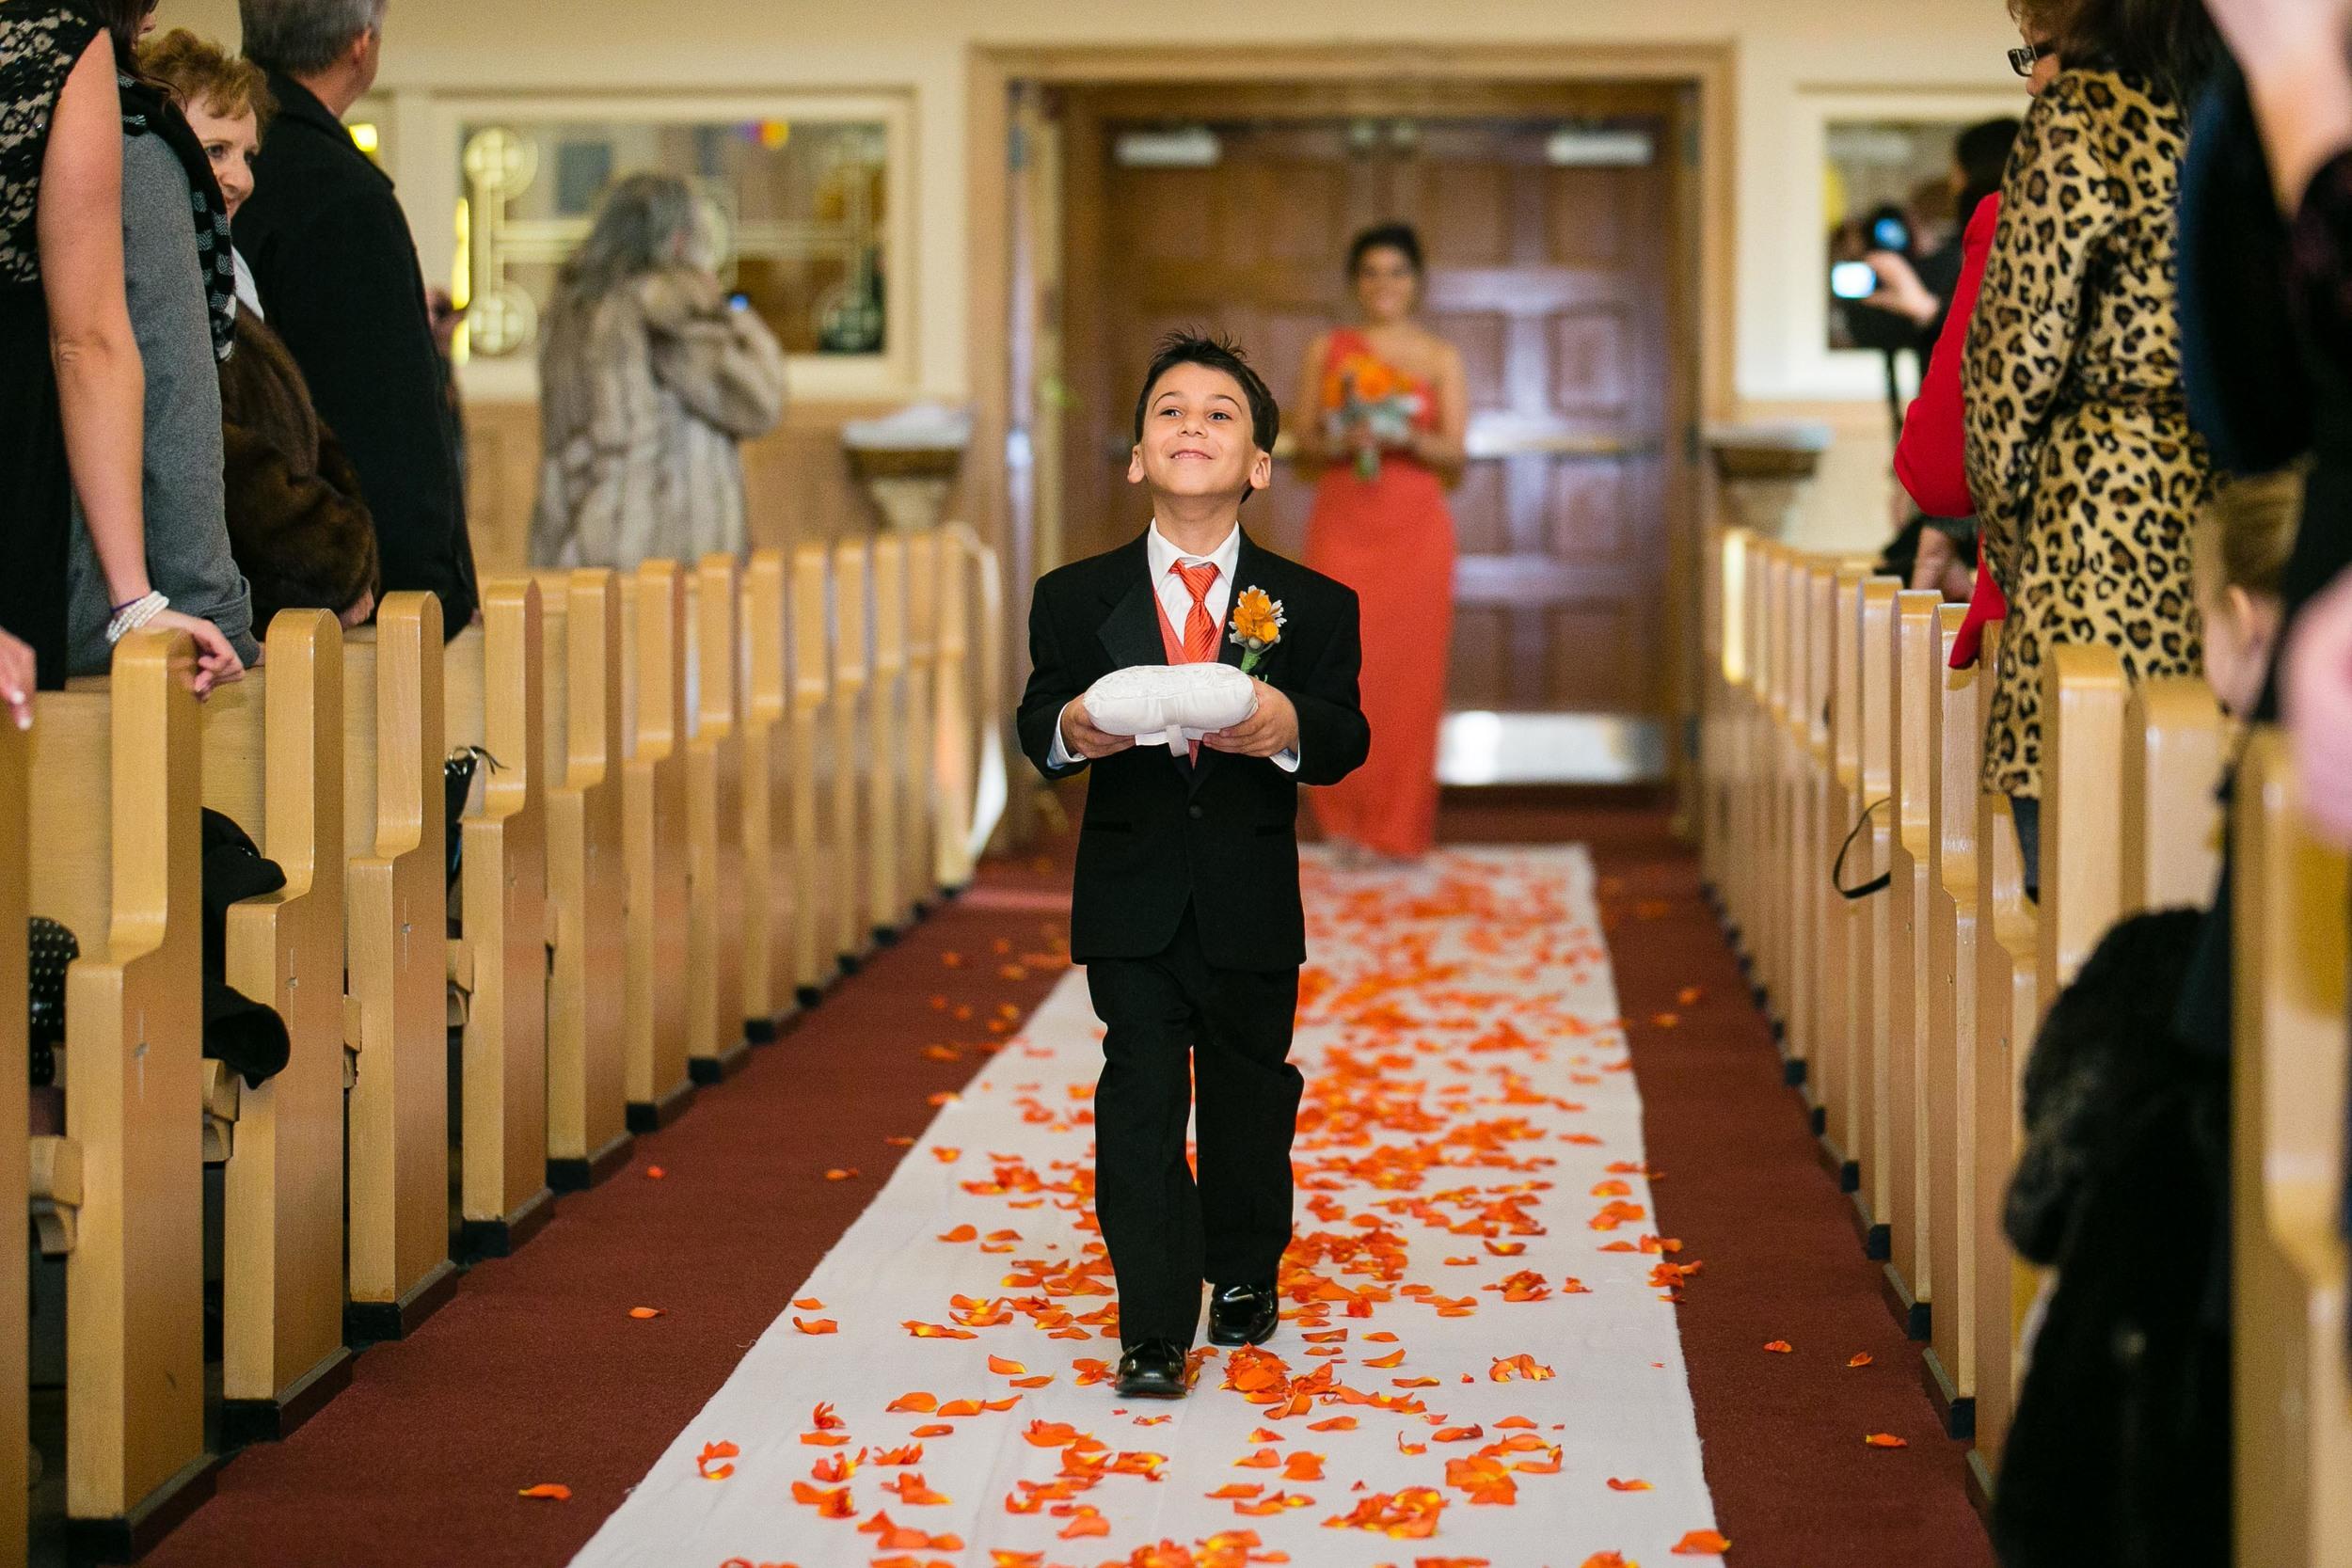 Greek-Wedding-Hartford-La-Notte-Restaurant-Connecticut-Documentary-Wedding-Photography-by-Jacek-Dolata-6.jpg